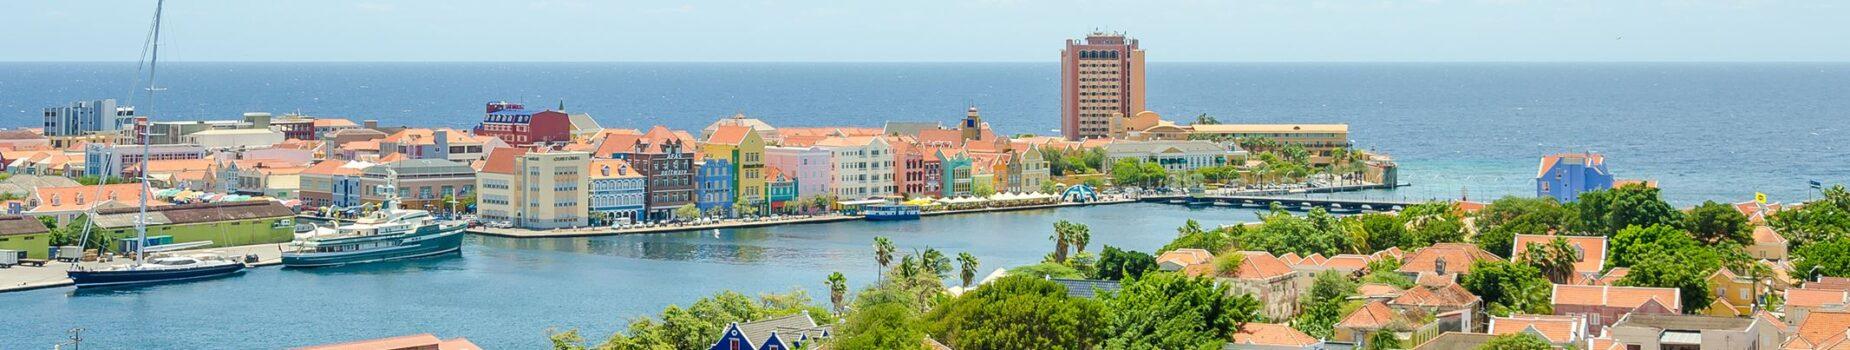 Fly Drive Curaçao